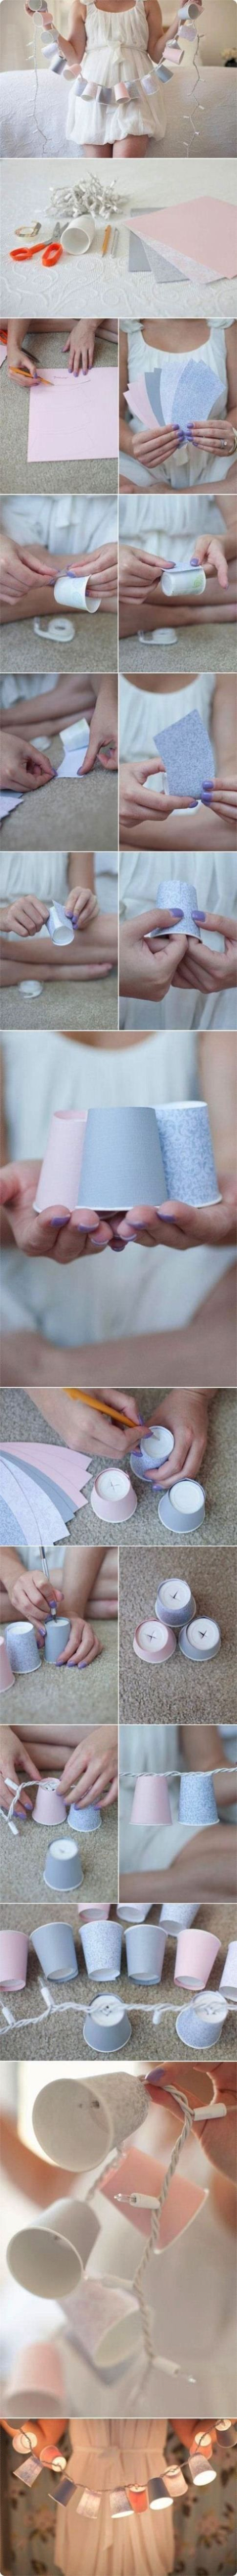 DIY :: Decorative Paper Cup Light Shade